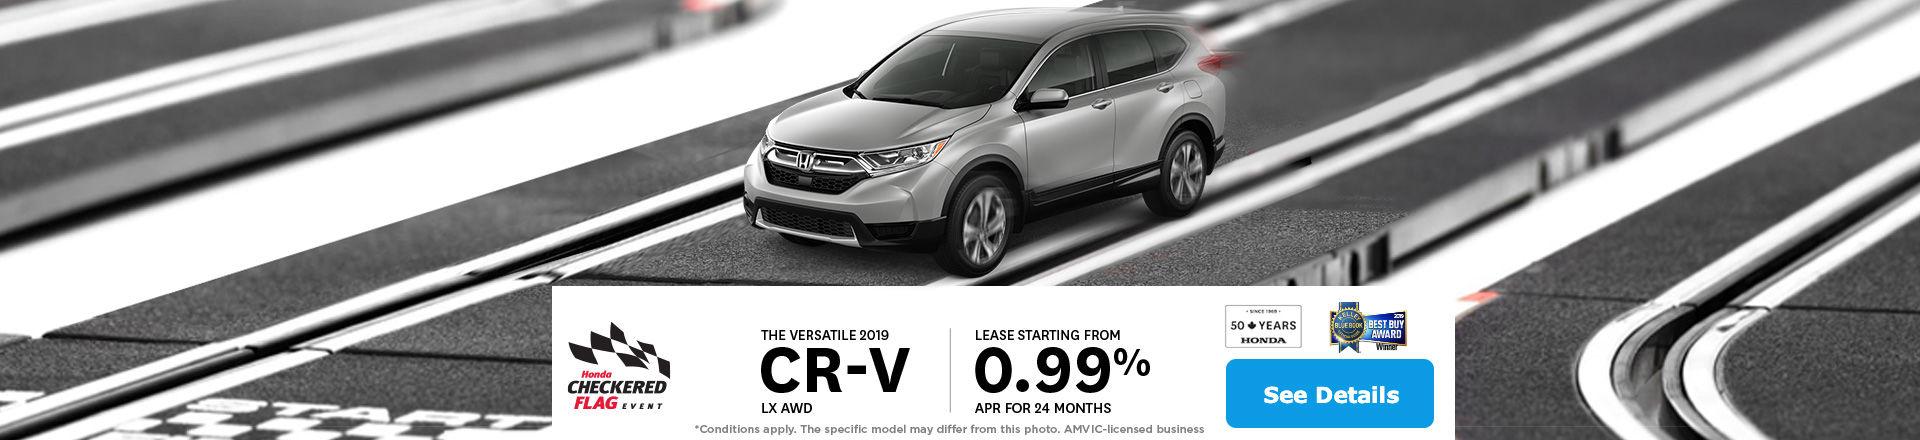 CR-V - headers